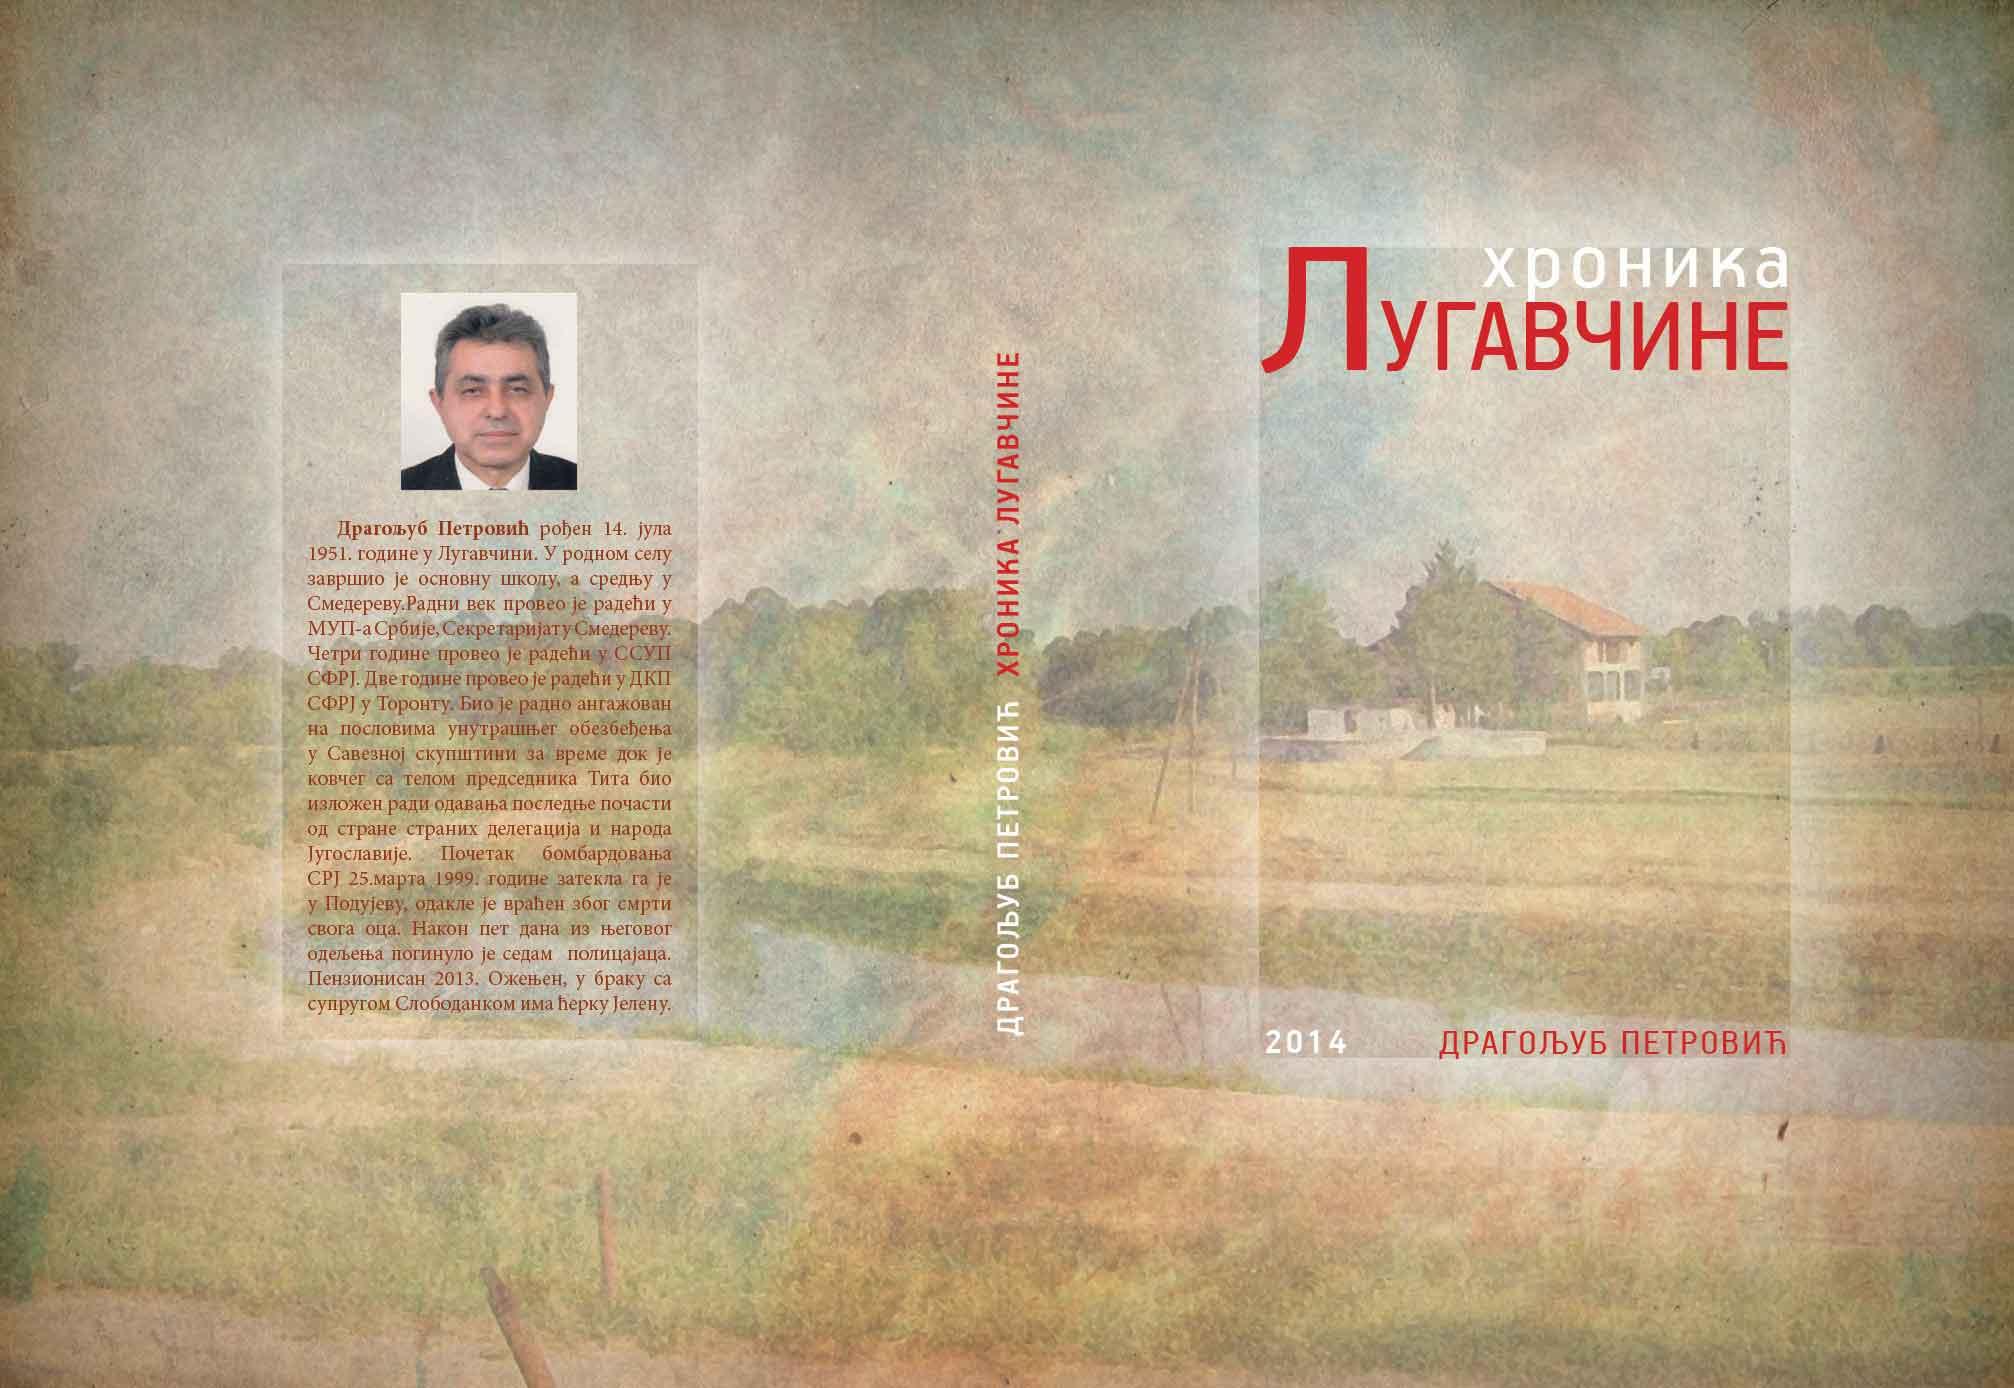 Hronika-Lugavcine-Dragoljub-Petrovic